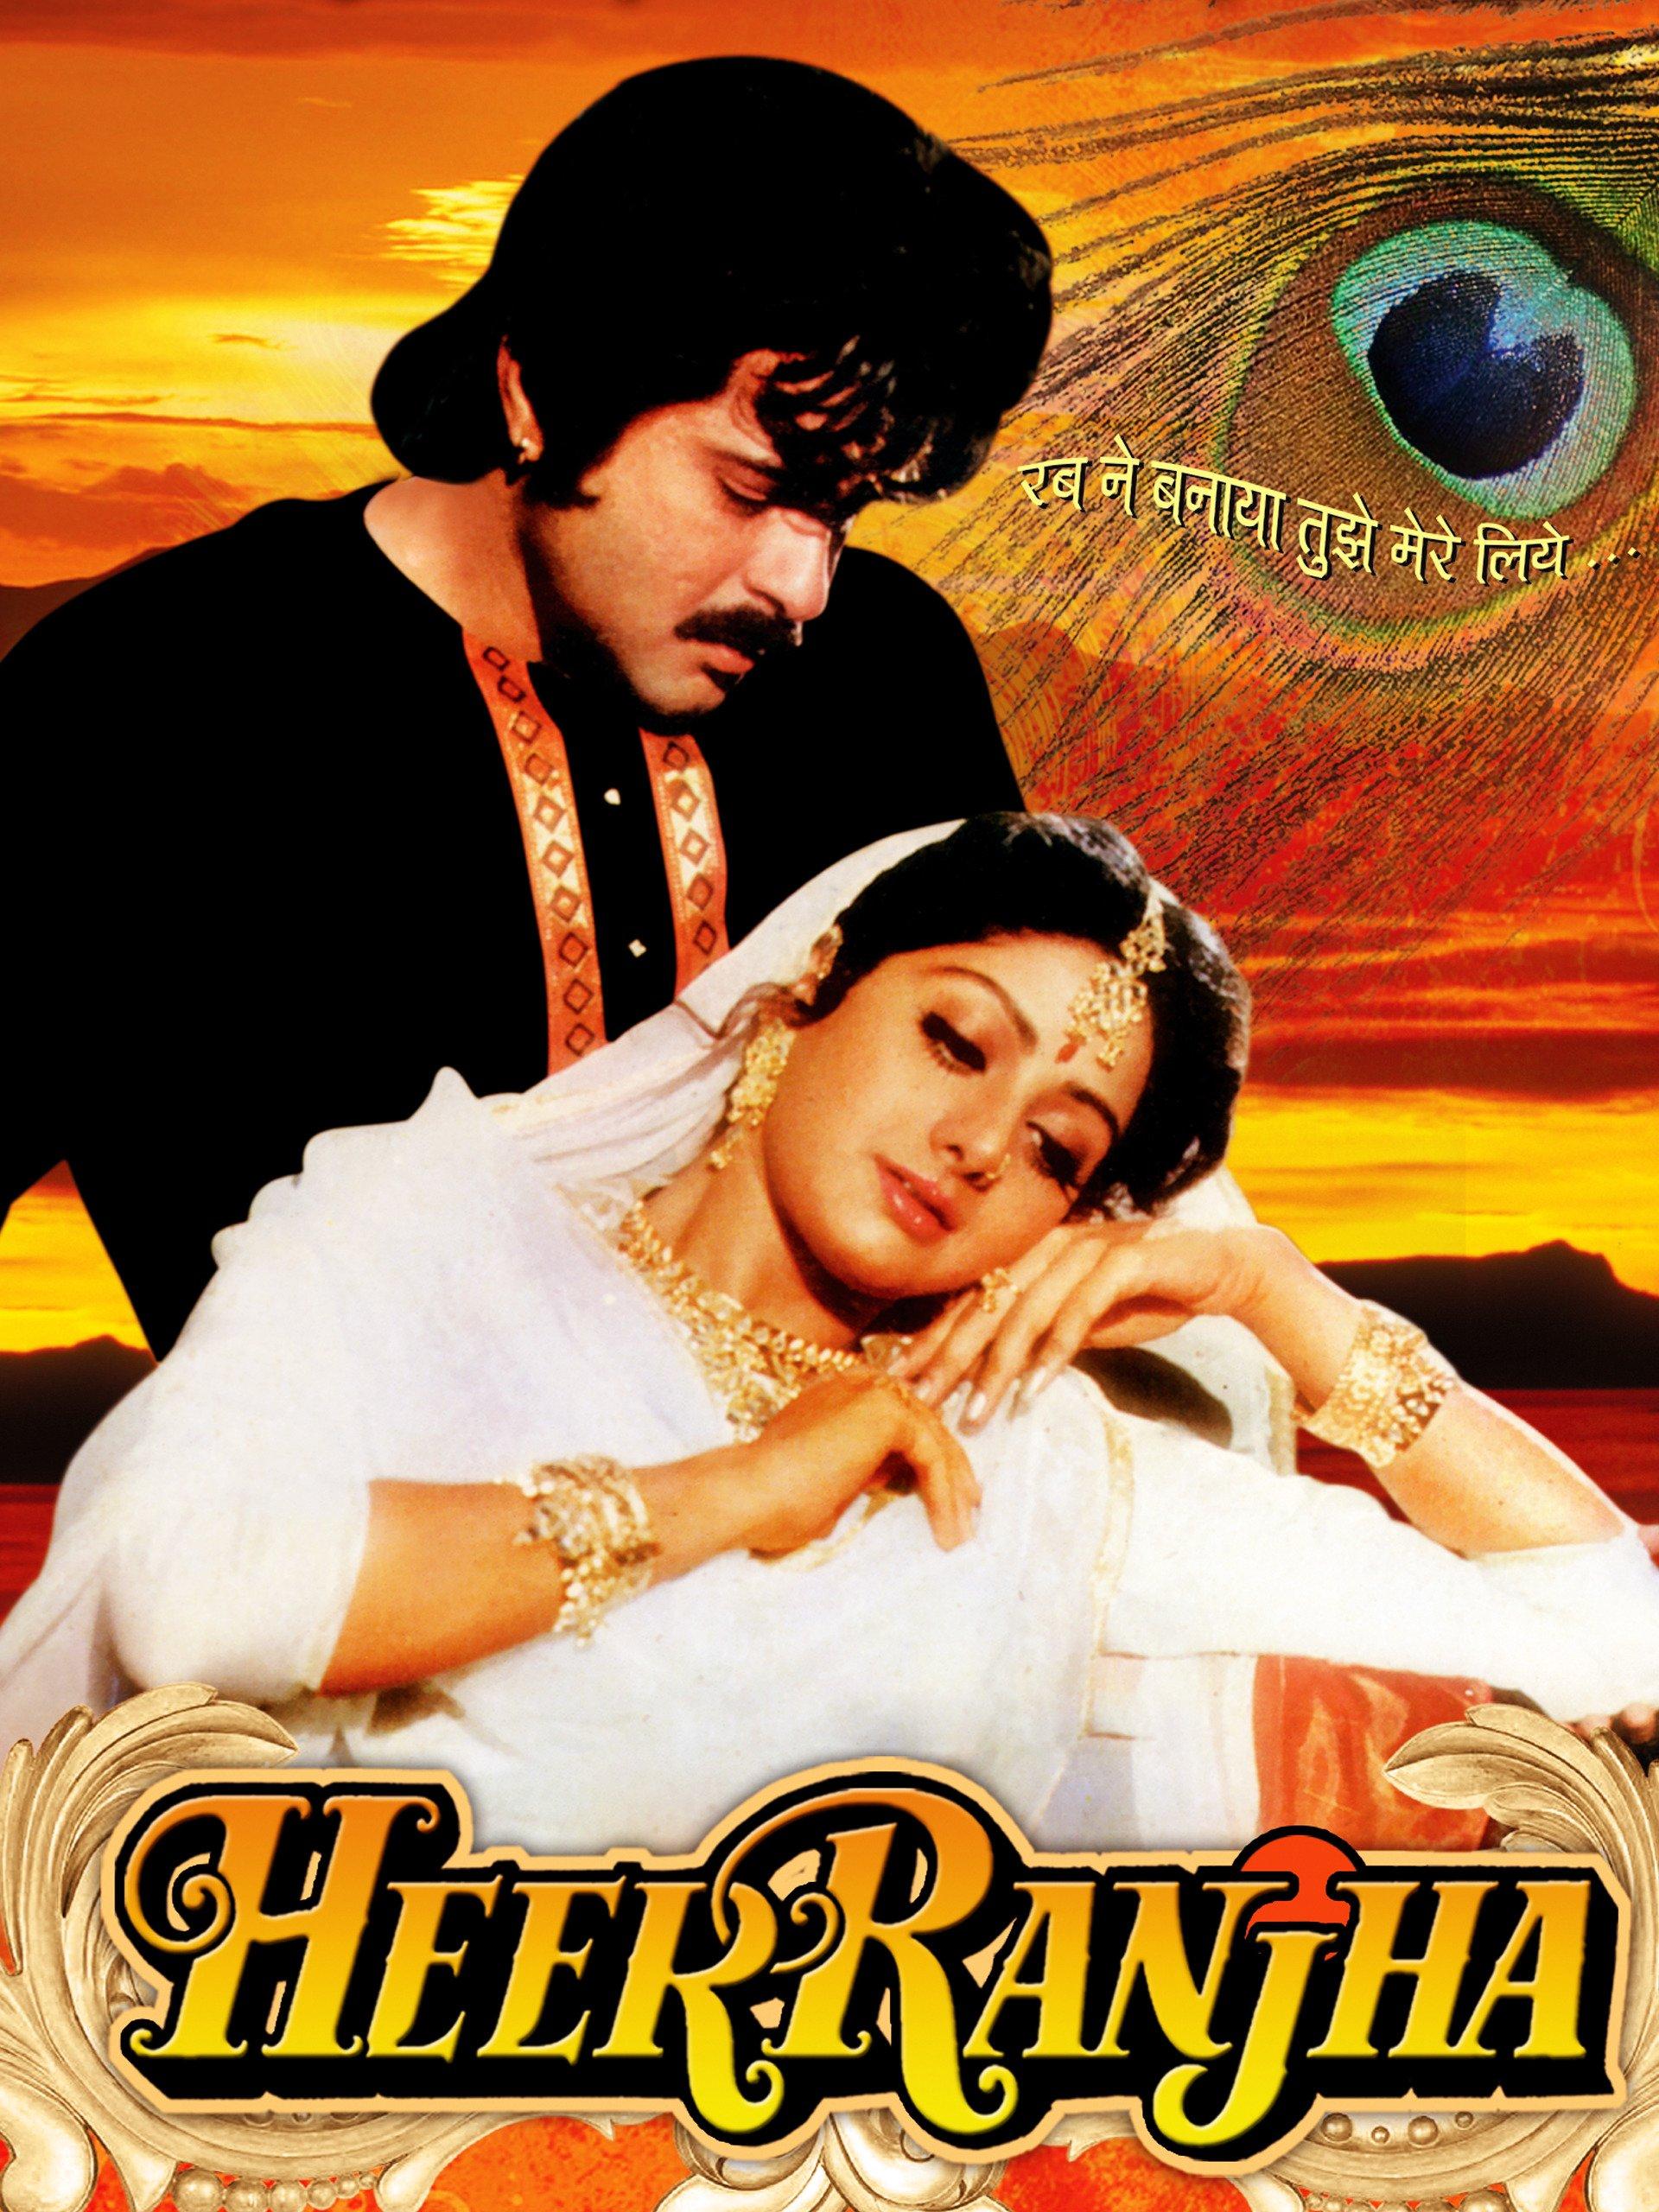 Heer ranjha 2009 full movie download sarah smith.